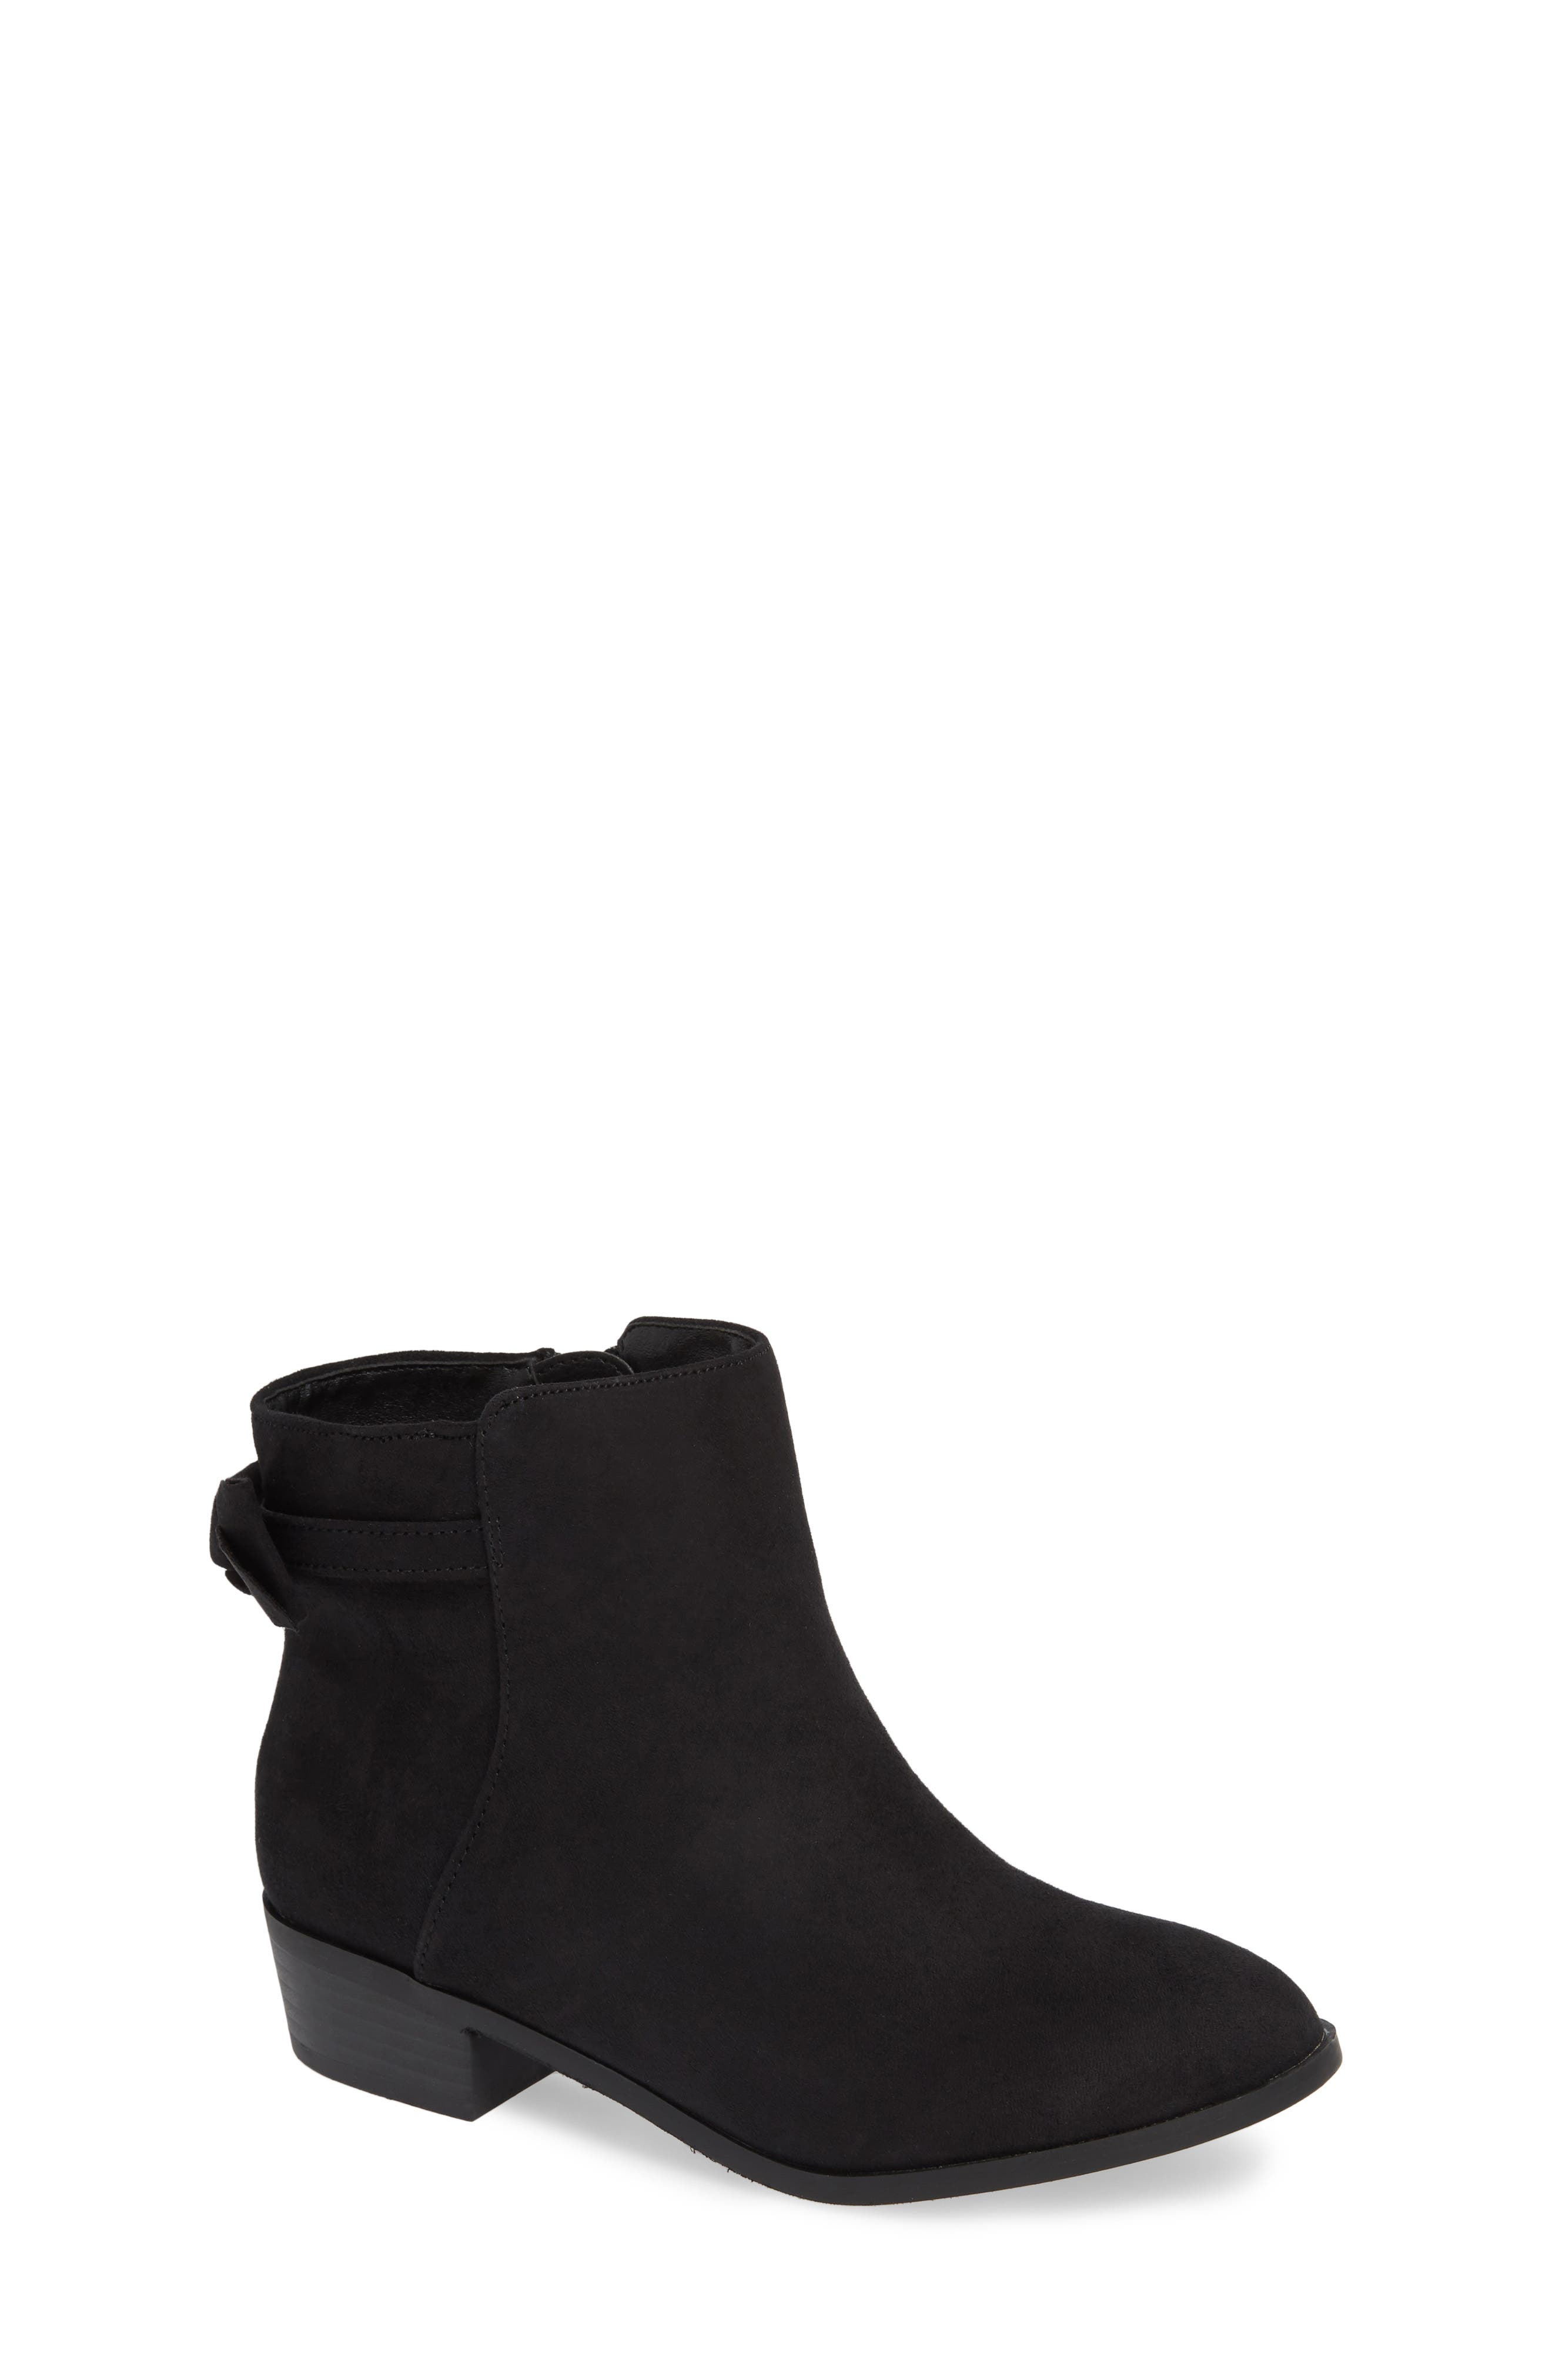 Girls Mia Little Fabiola Boot Size 2 M  Black